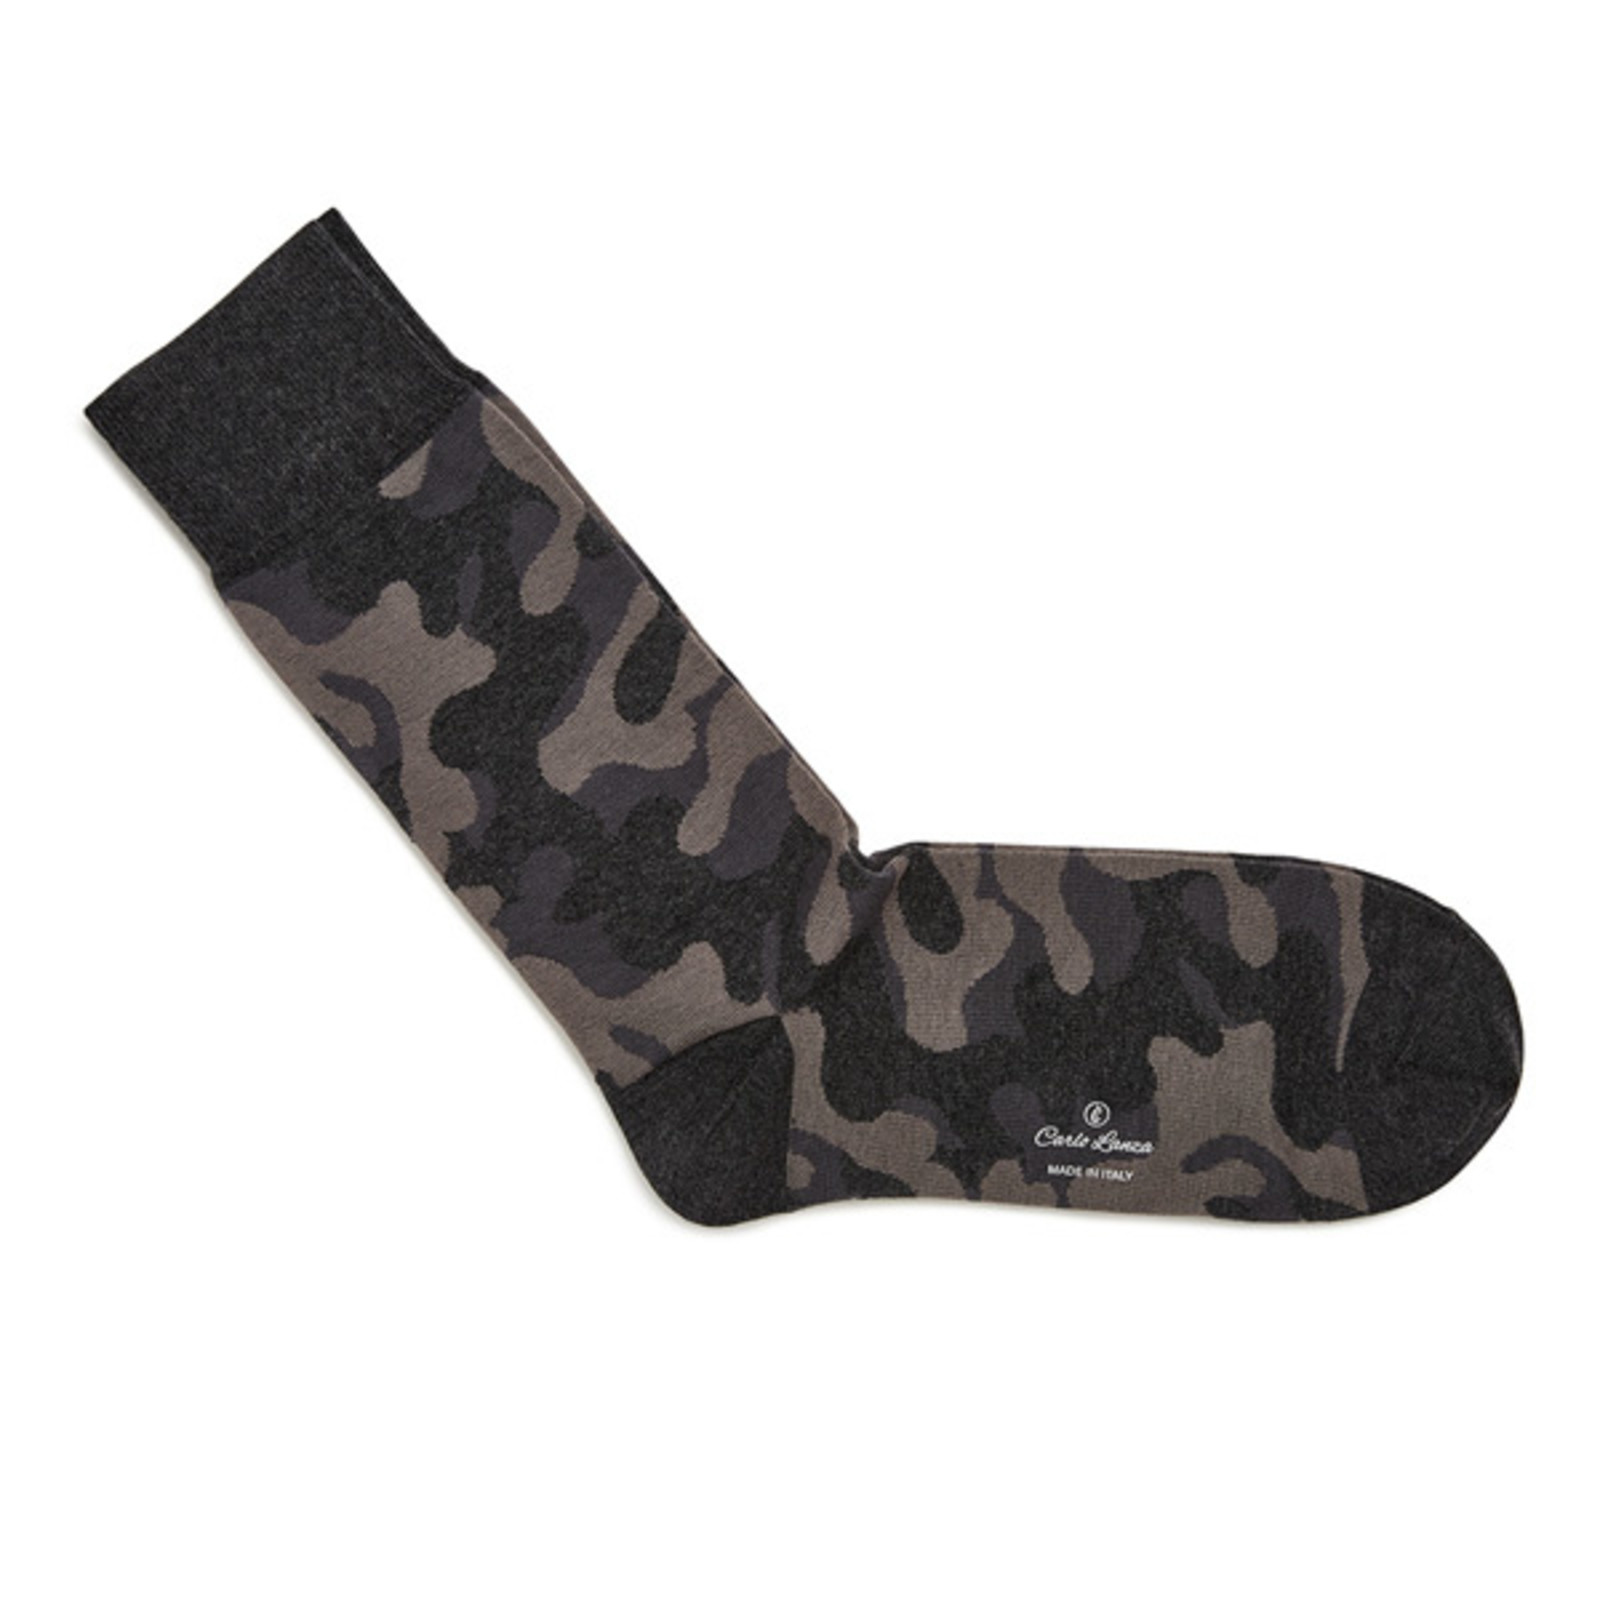 Carlo Lanza Camouflage katoenen sokken grijs | Carlo Lanza